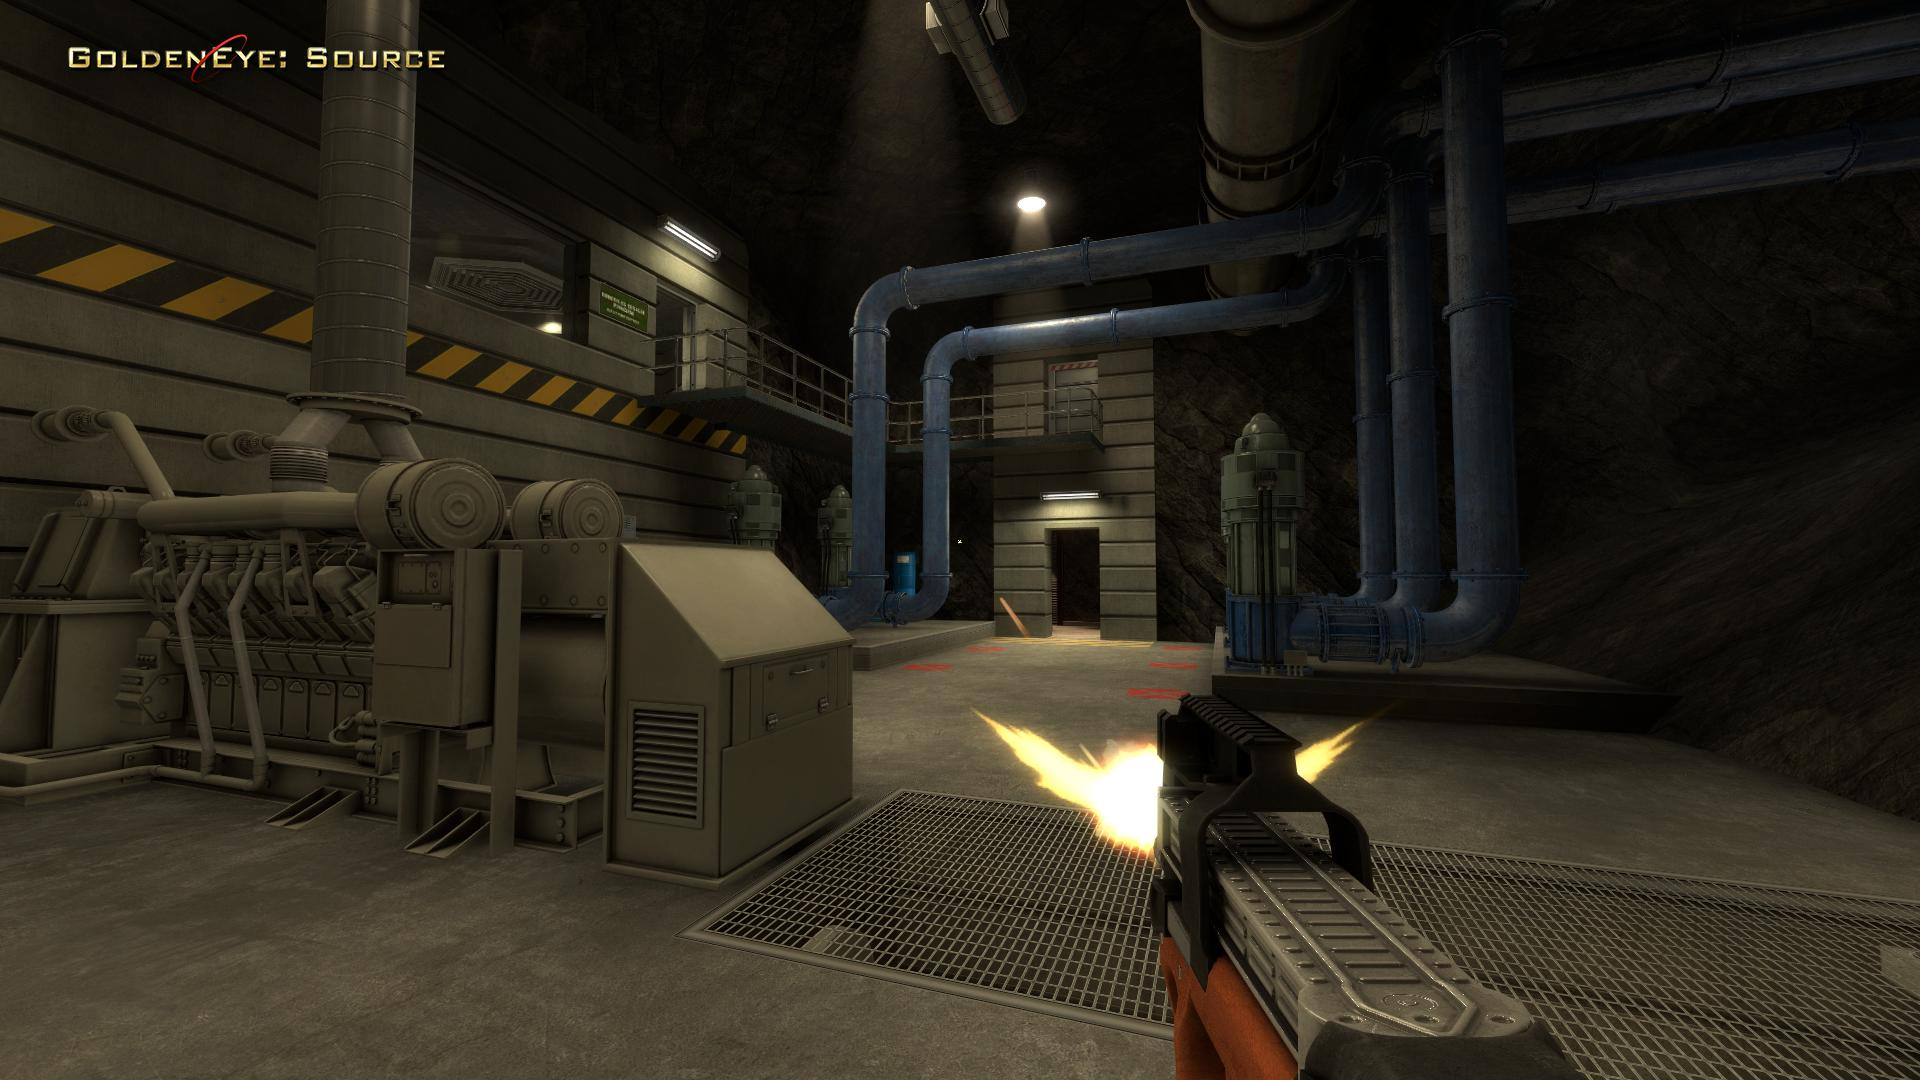 GoldenEye: Source (PC) – GameCola  Goldeneye